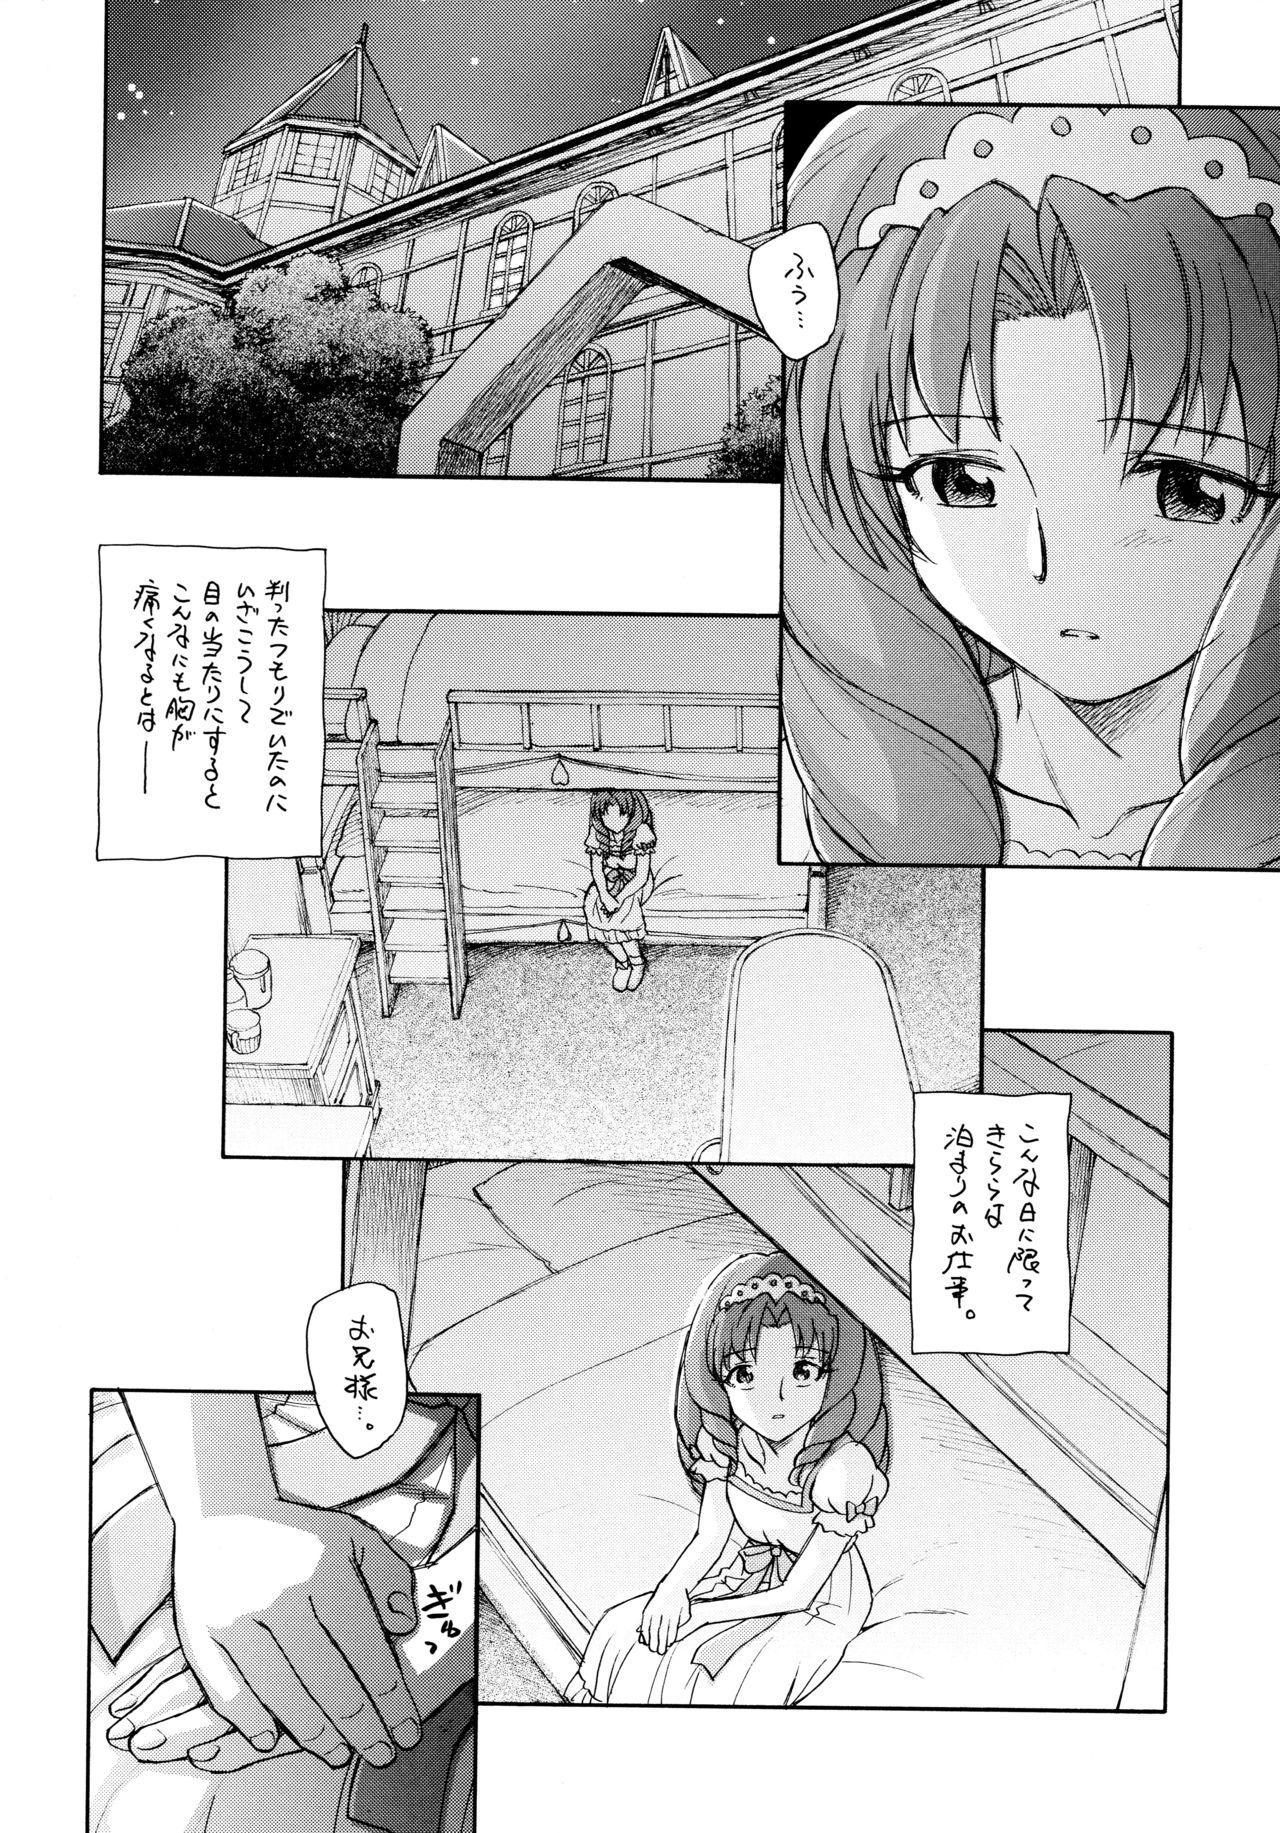 Kirakira Boshi Hensoukyoku 5